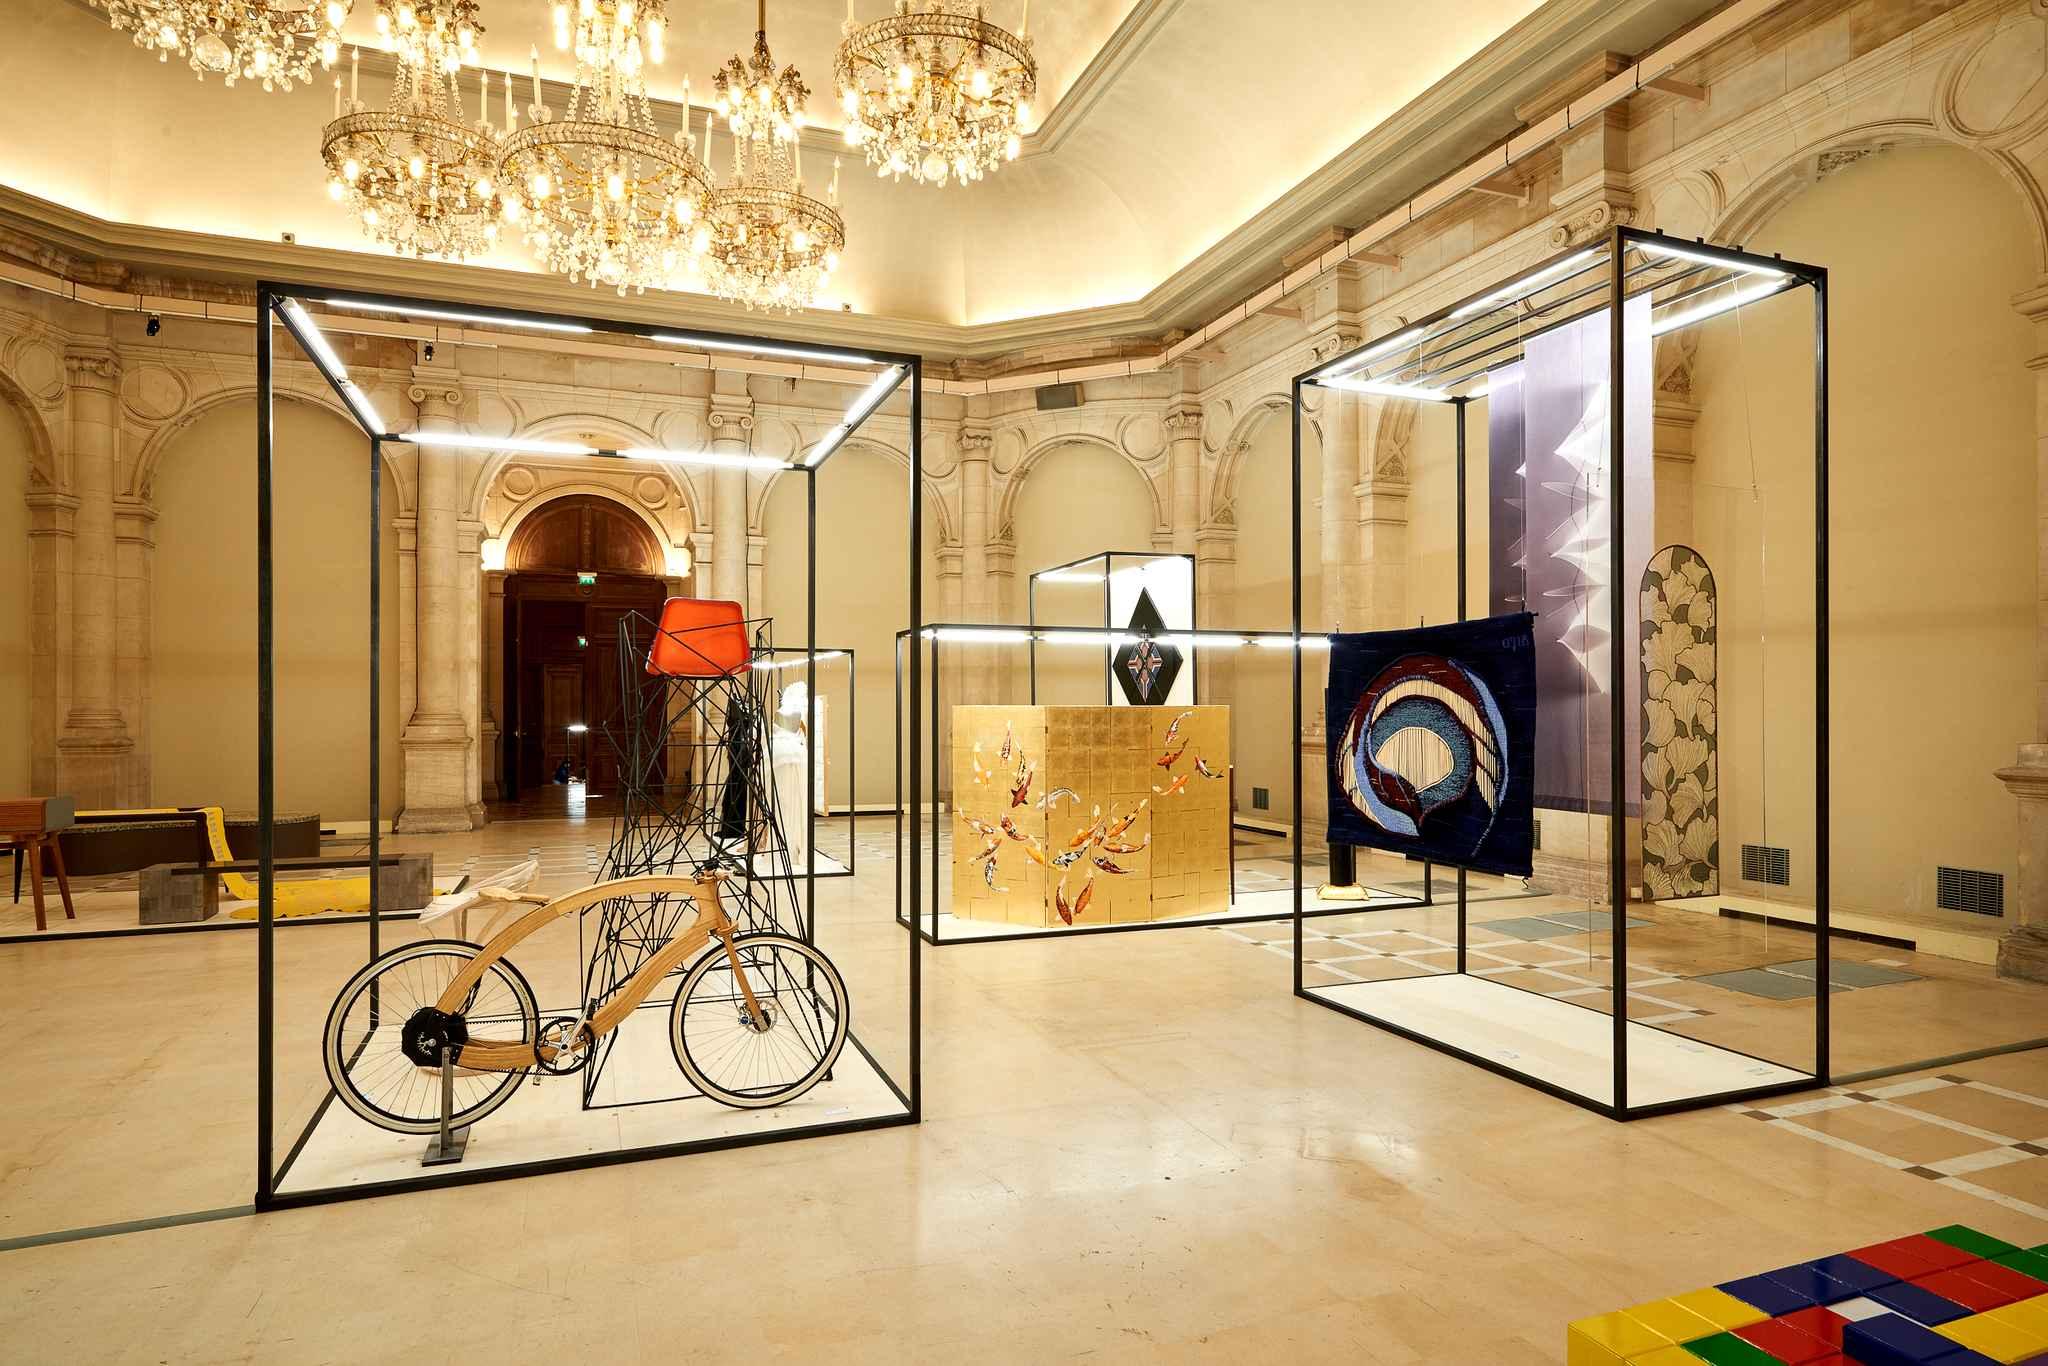 Design & Artisanat d'Art | Les Industries Culturelles ...